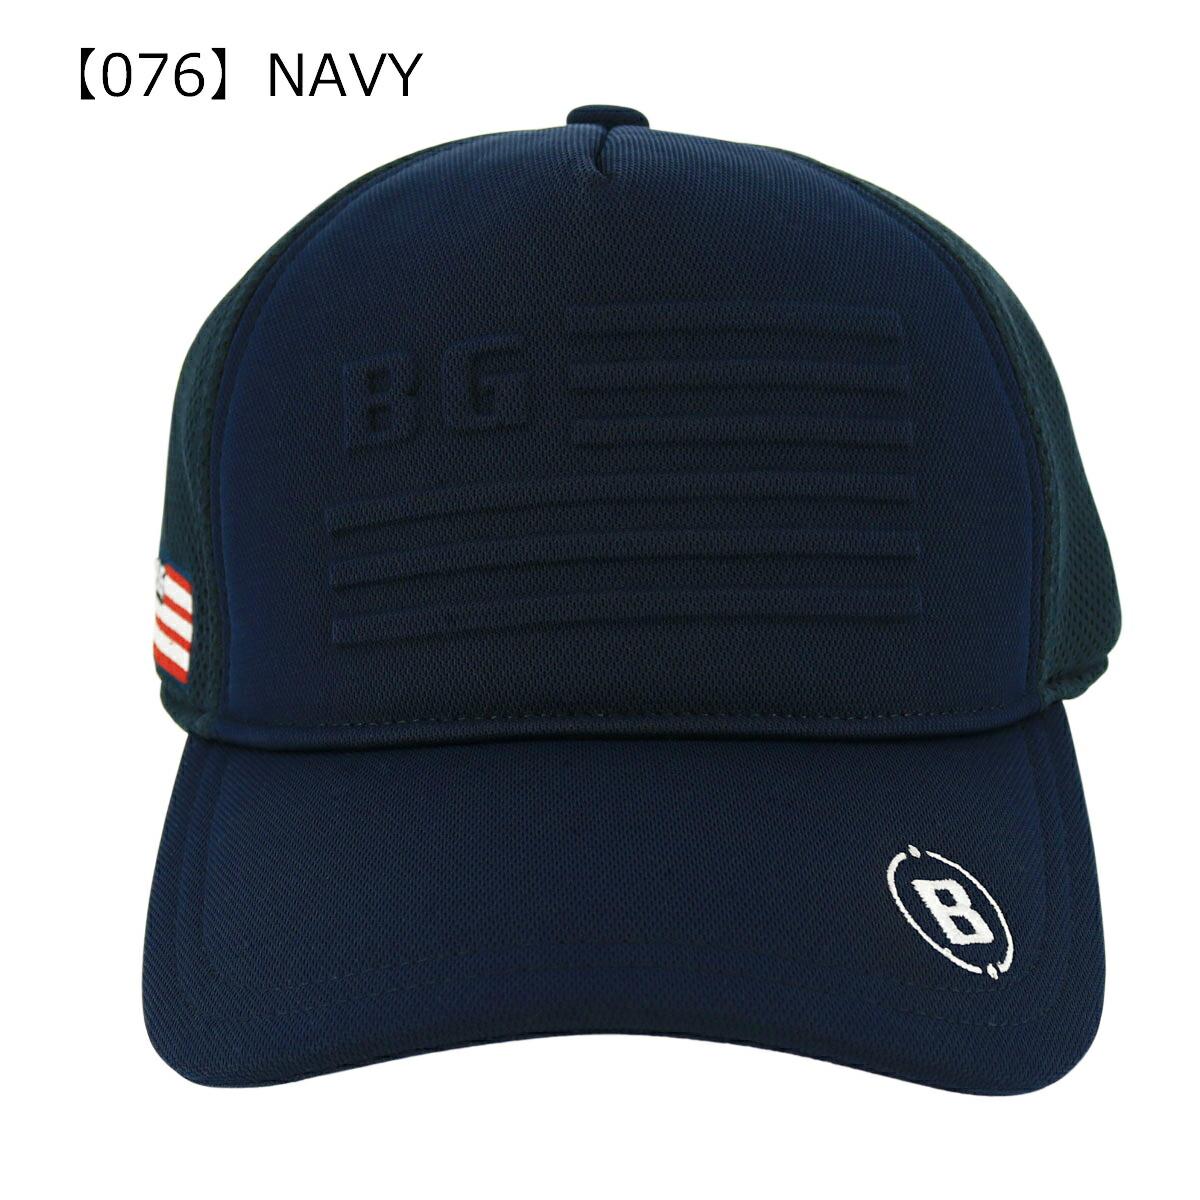 【076】NAVY